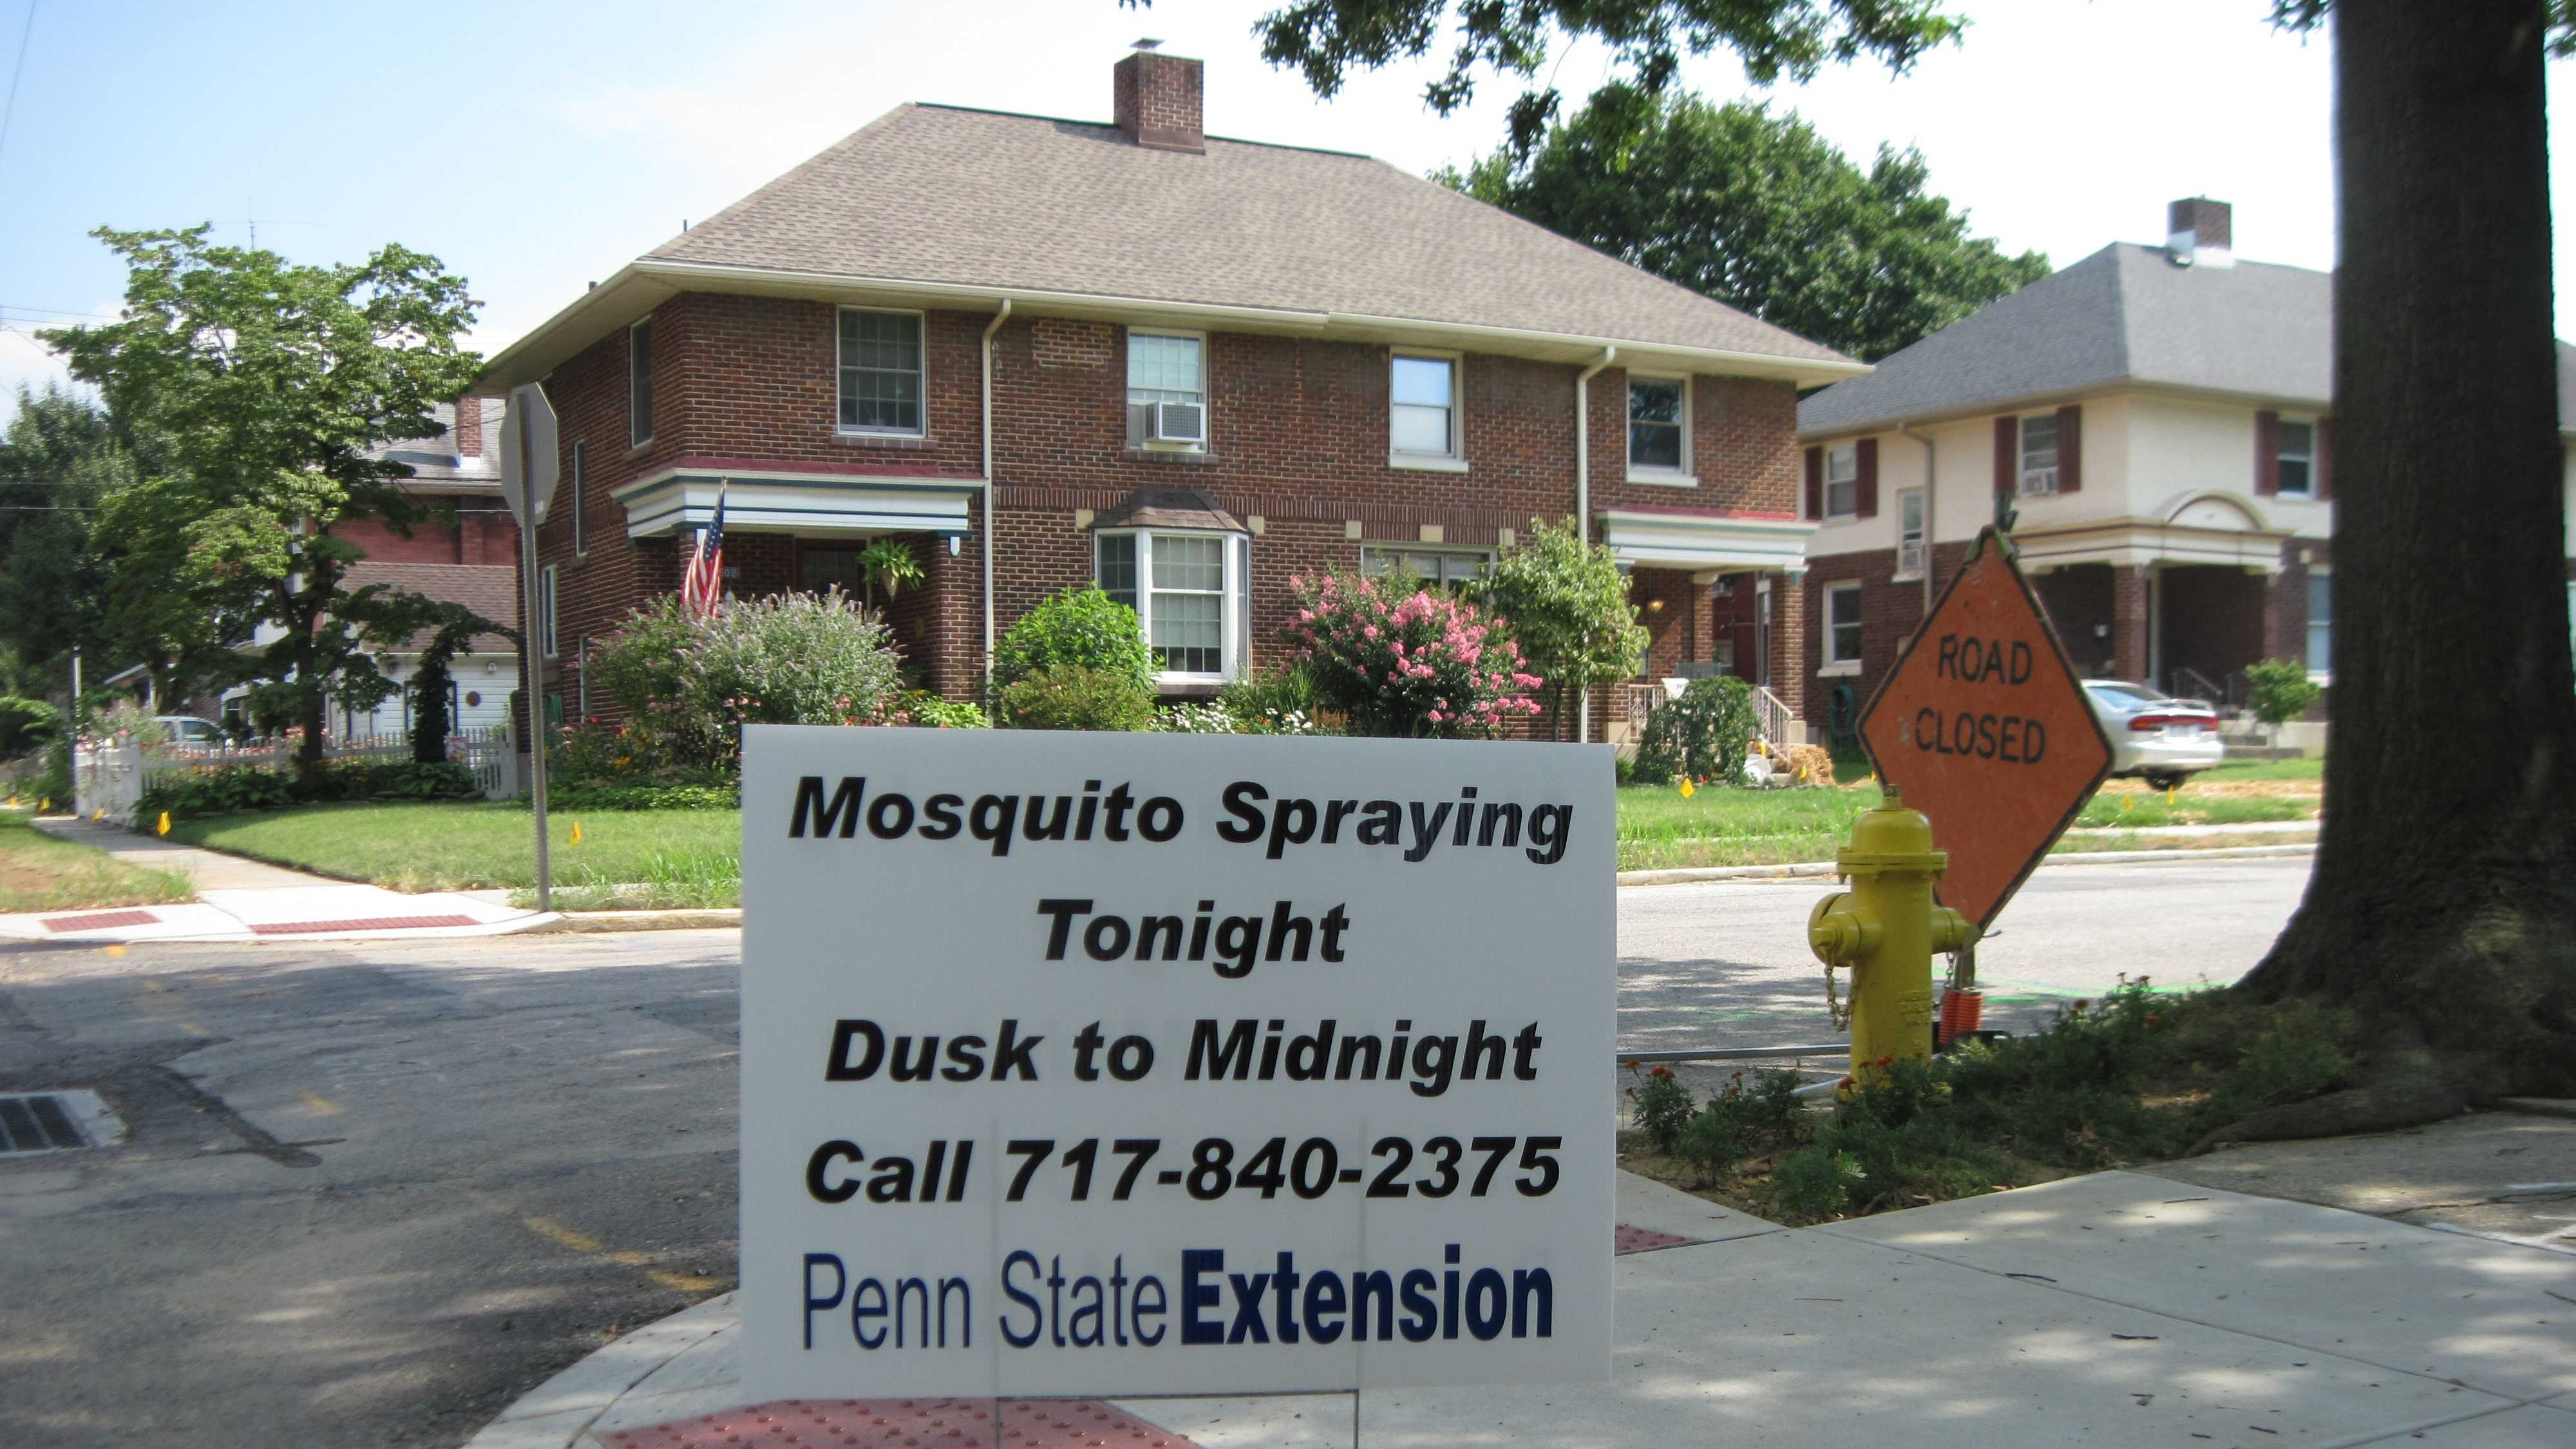 7.26.14Mosquito Spray Sign